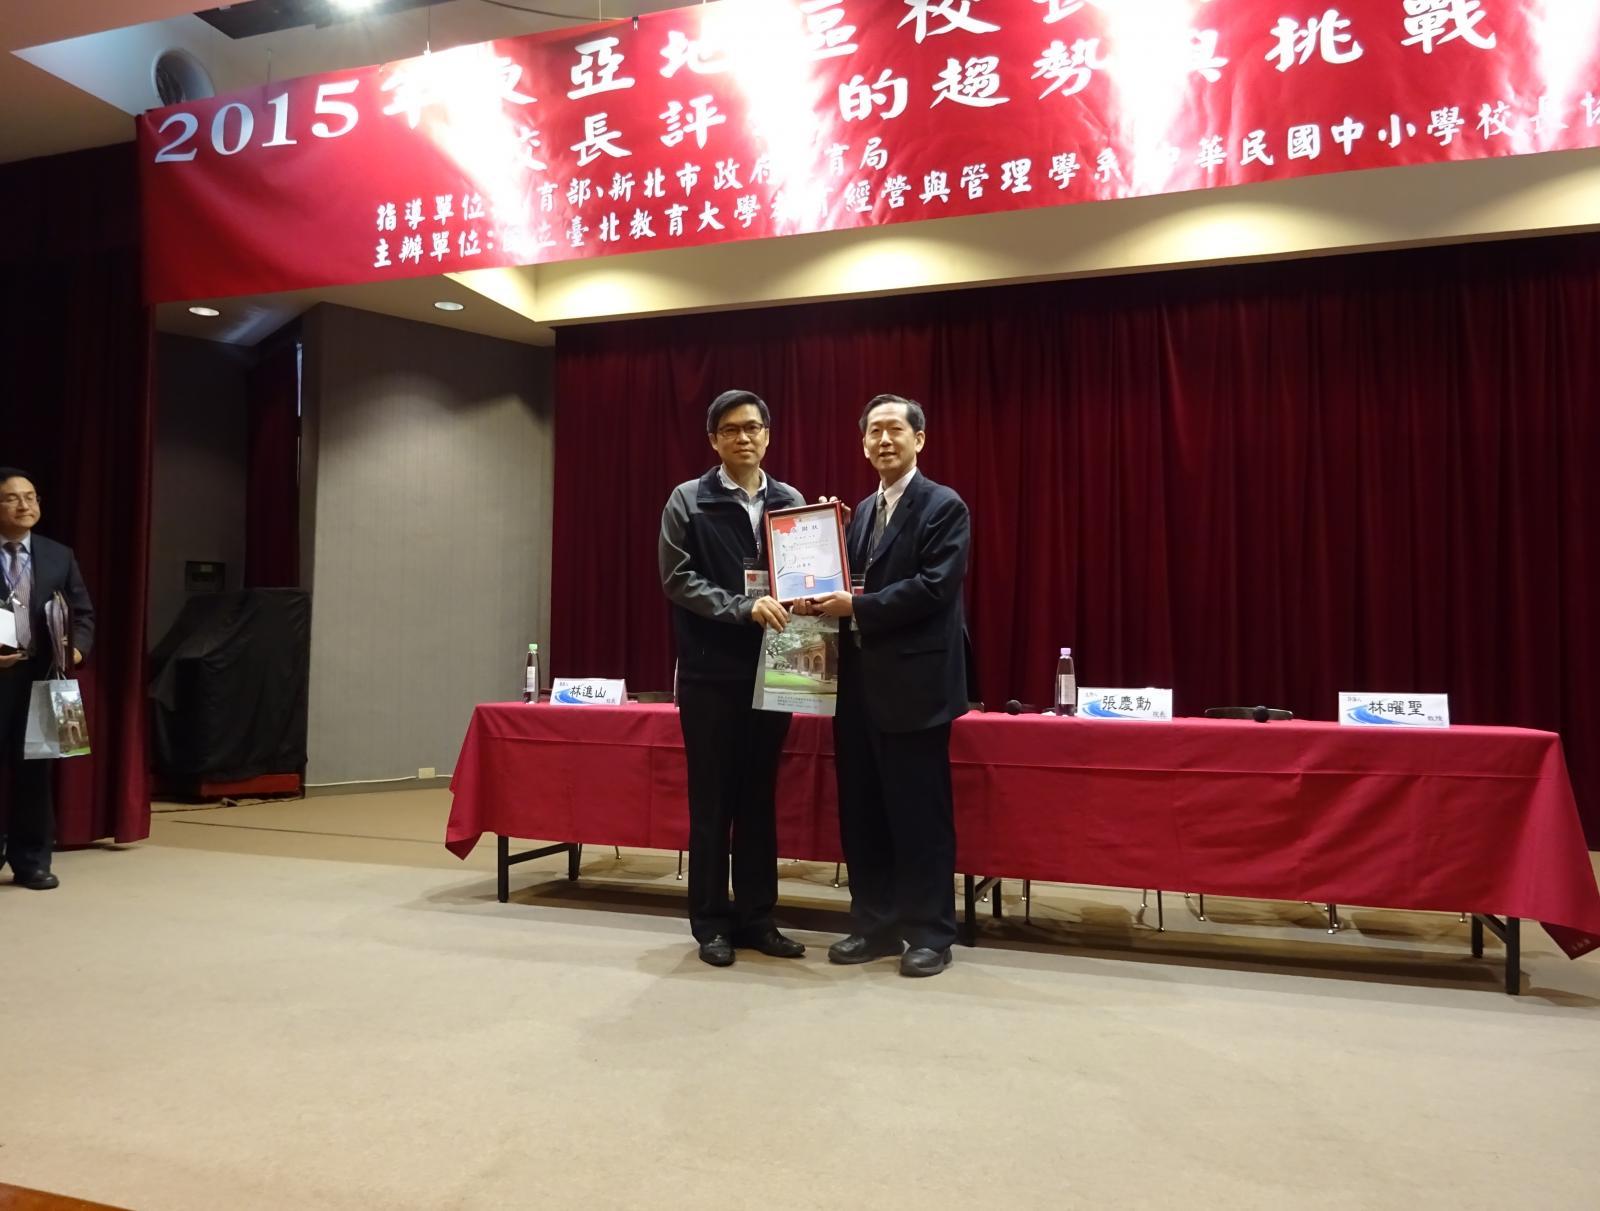 http://principal.ezschool.tw/uploads/tadgallery/2015_11_29/35_DSC05754.JPG